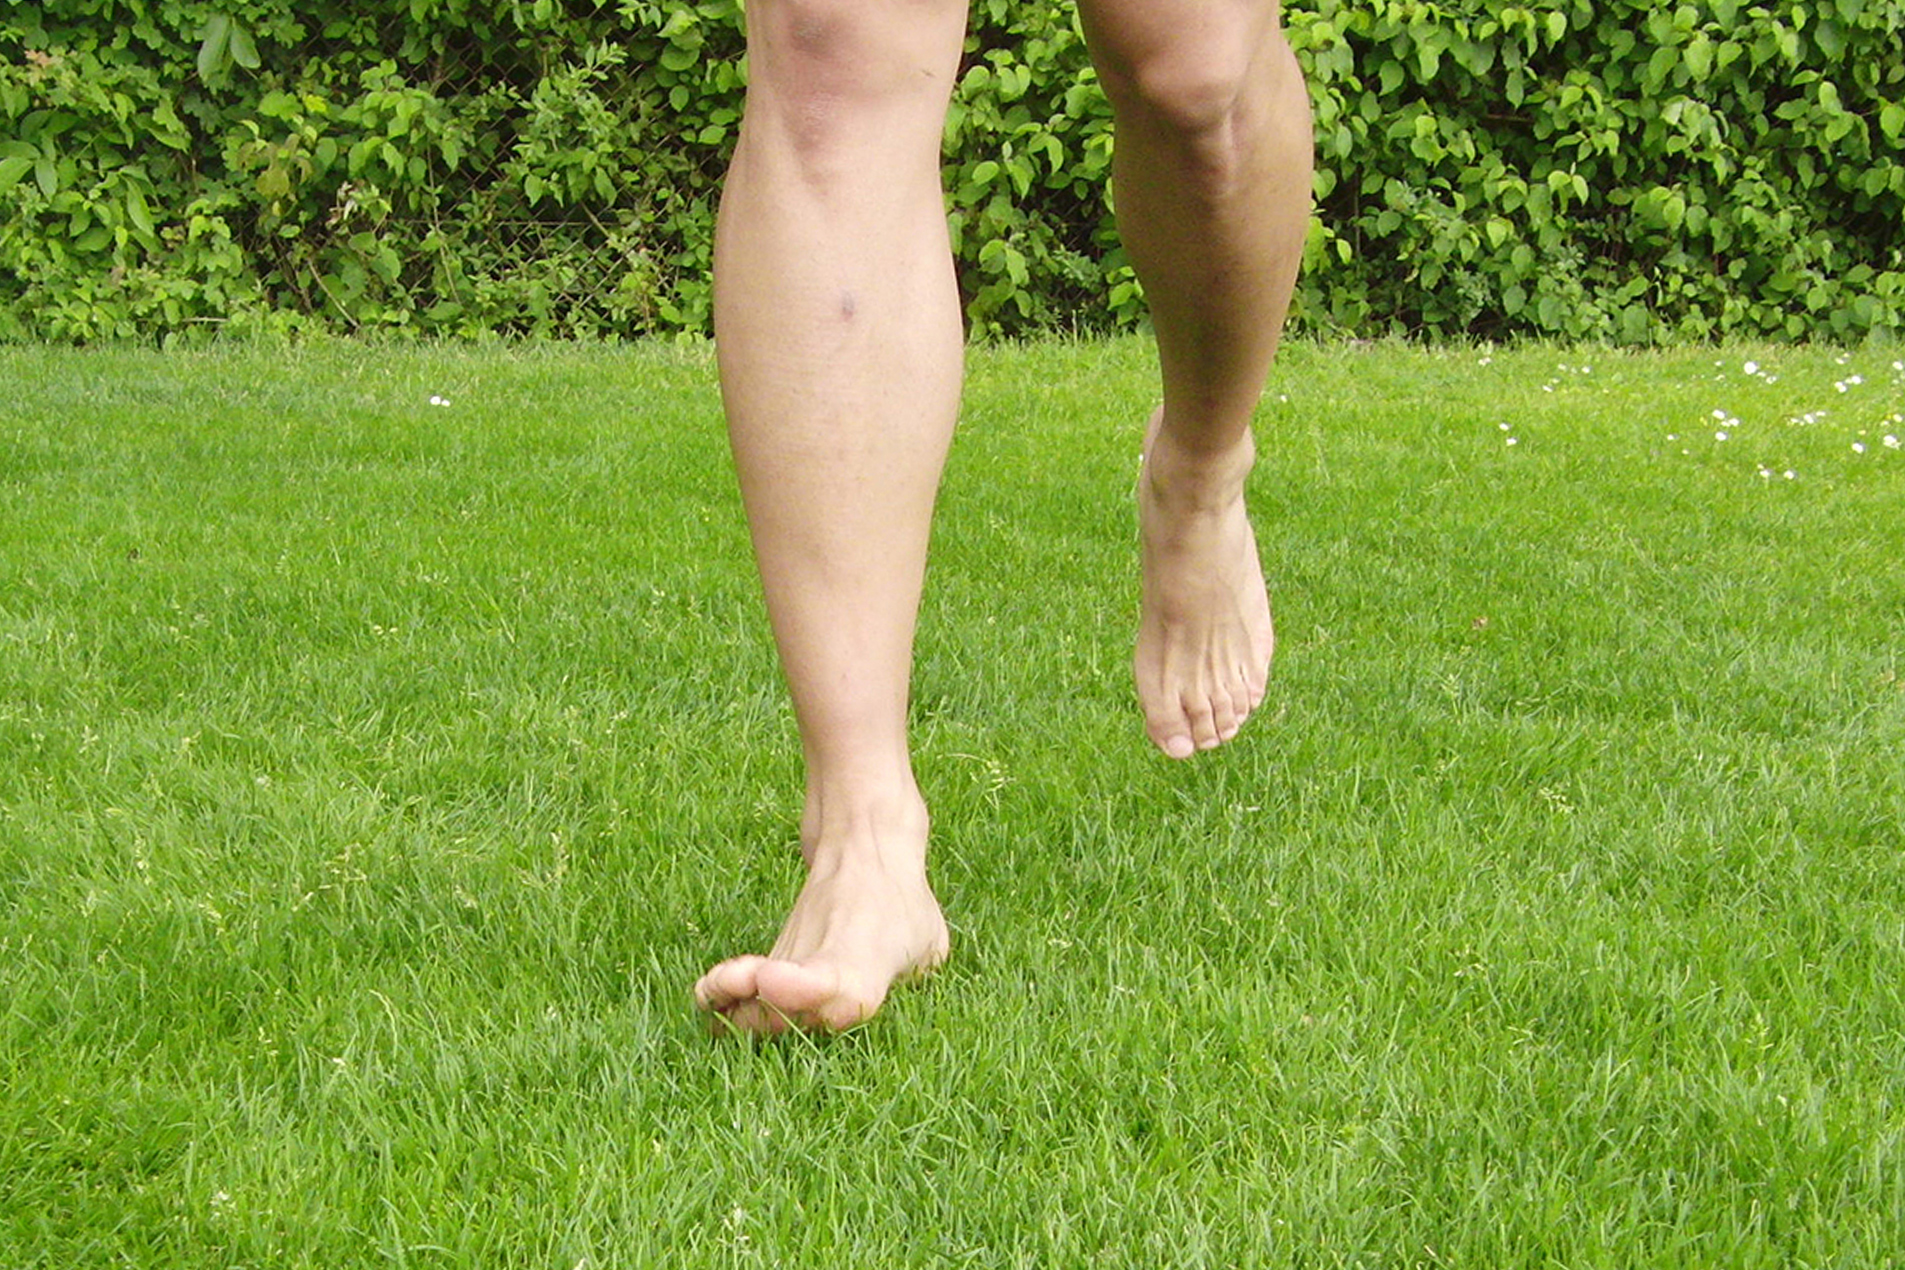 Dr. Matthias Marquardt, MARQUARDT RUNNING Athletik-Uebung: Barfußlaufen